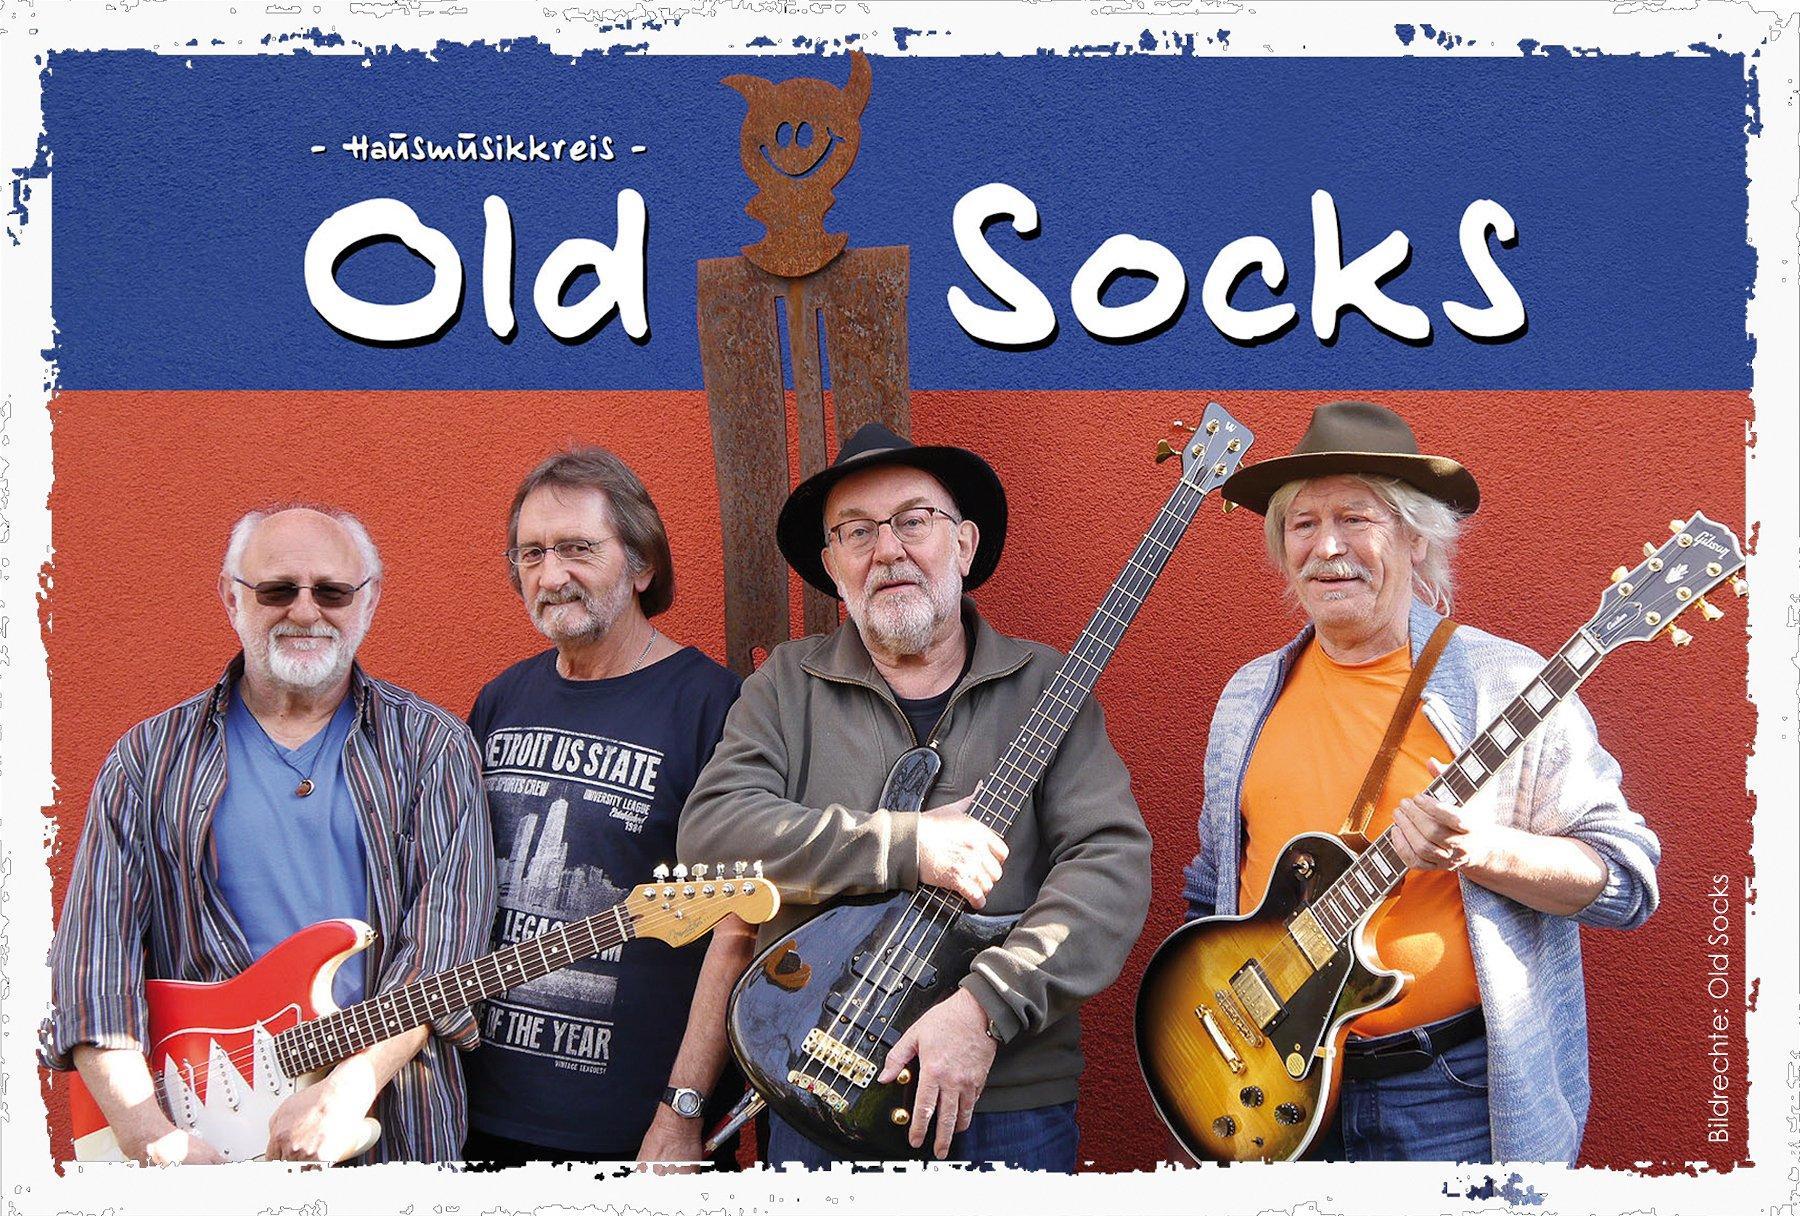 Songlines Vol. I - © Old Socks